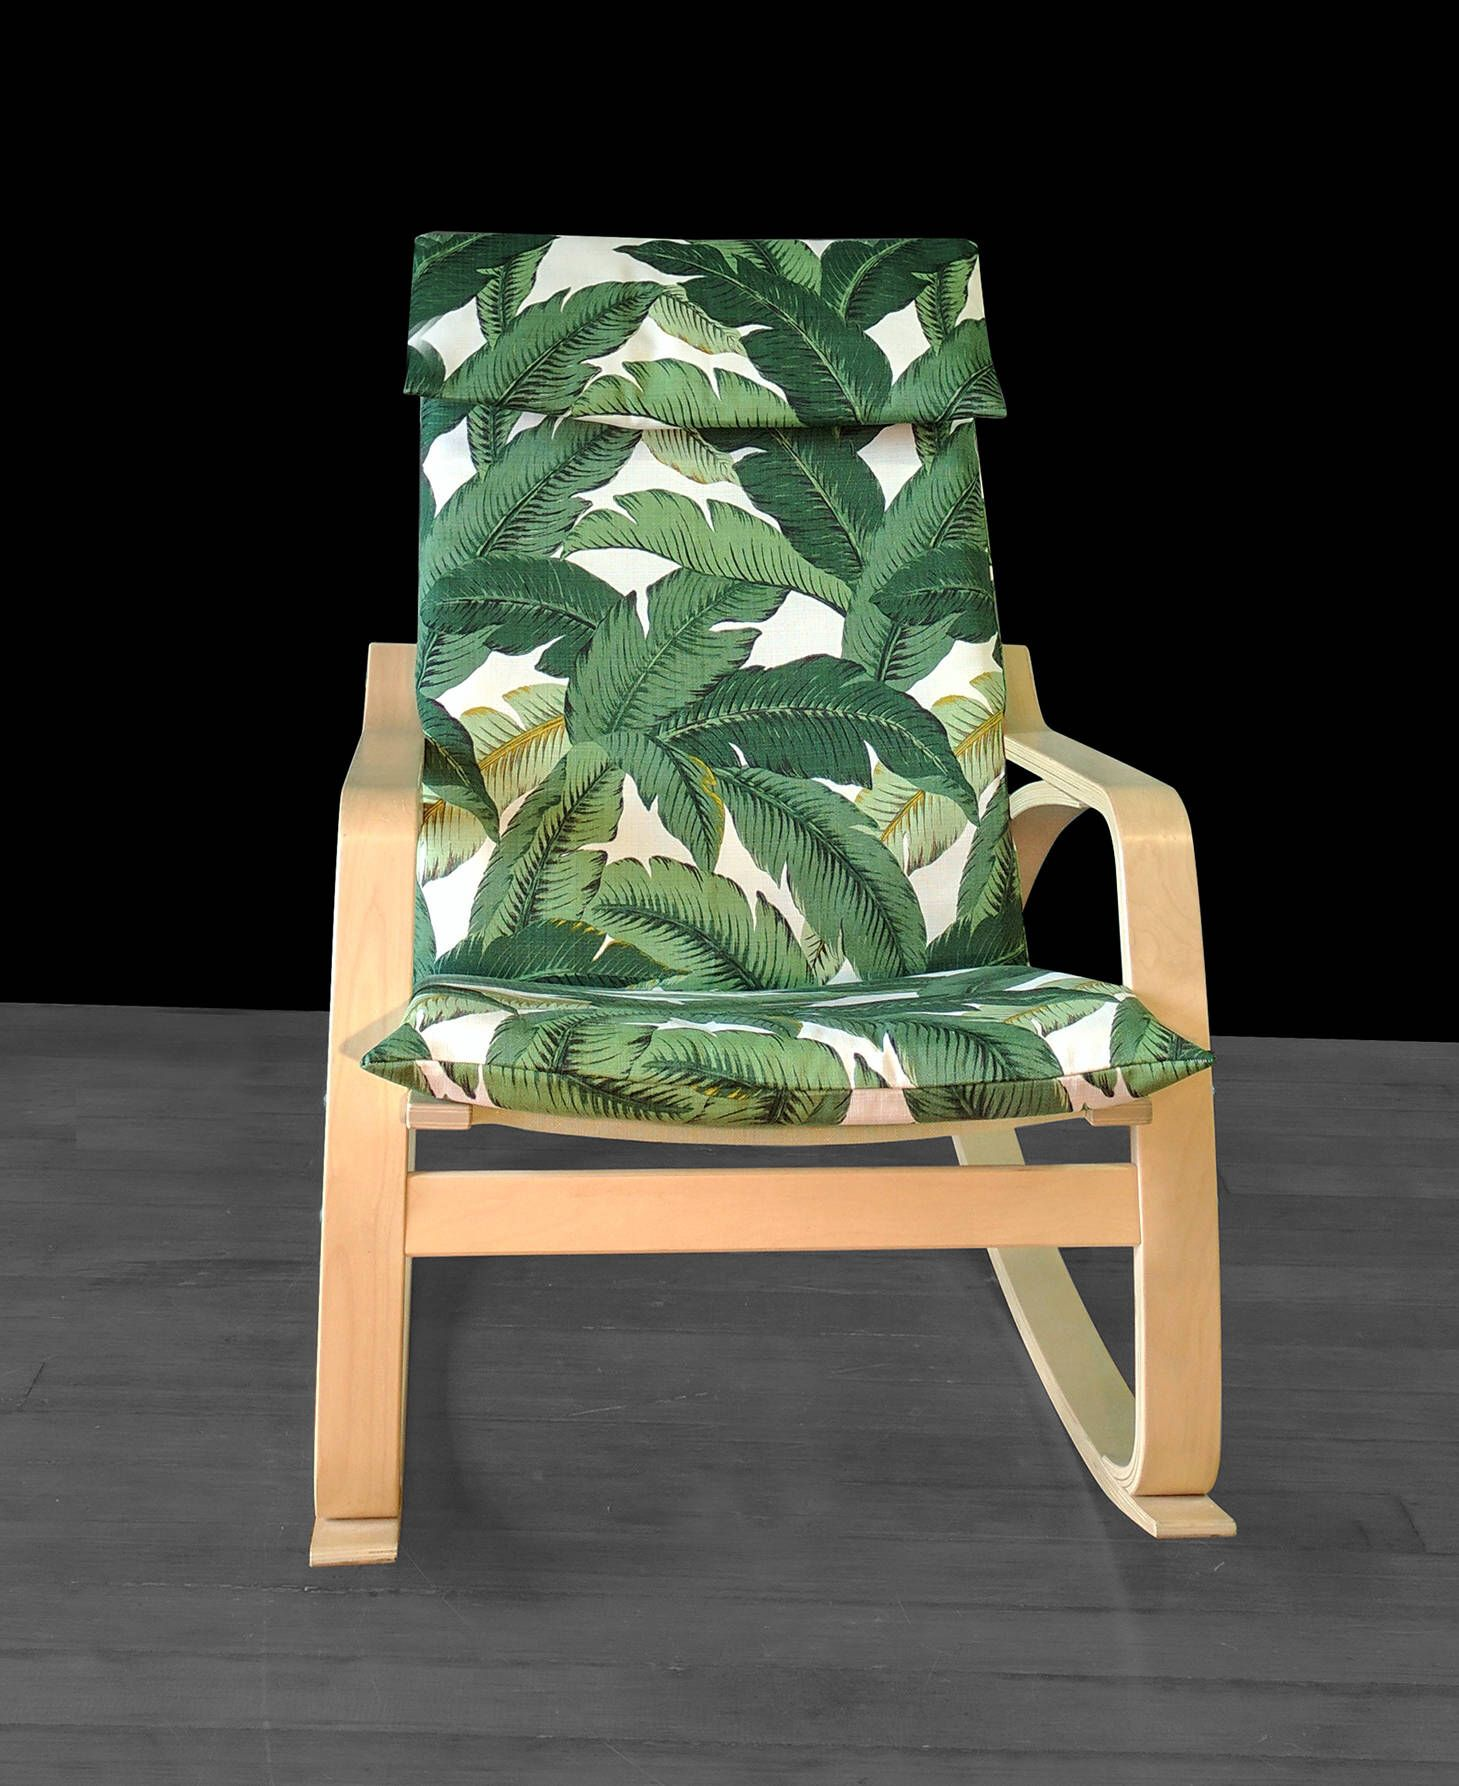 Tropical Leaf IKEA POÄNG Chair Covers, Summer House Ikea